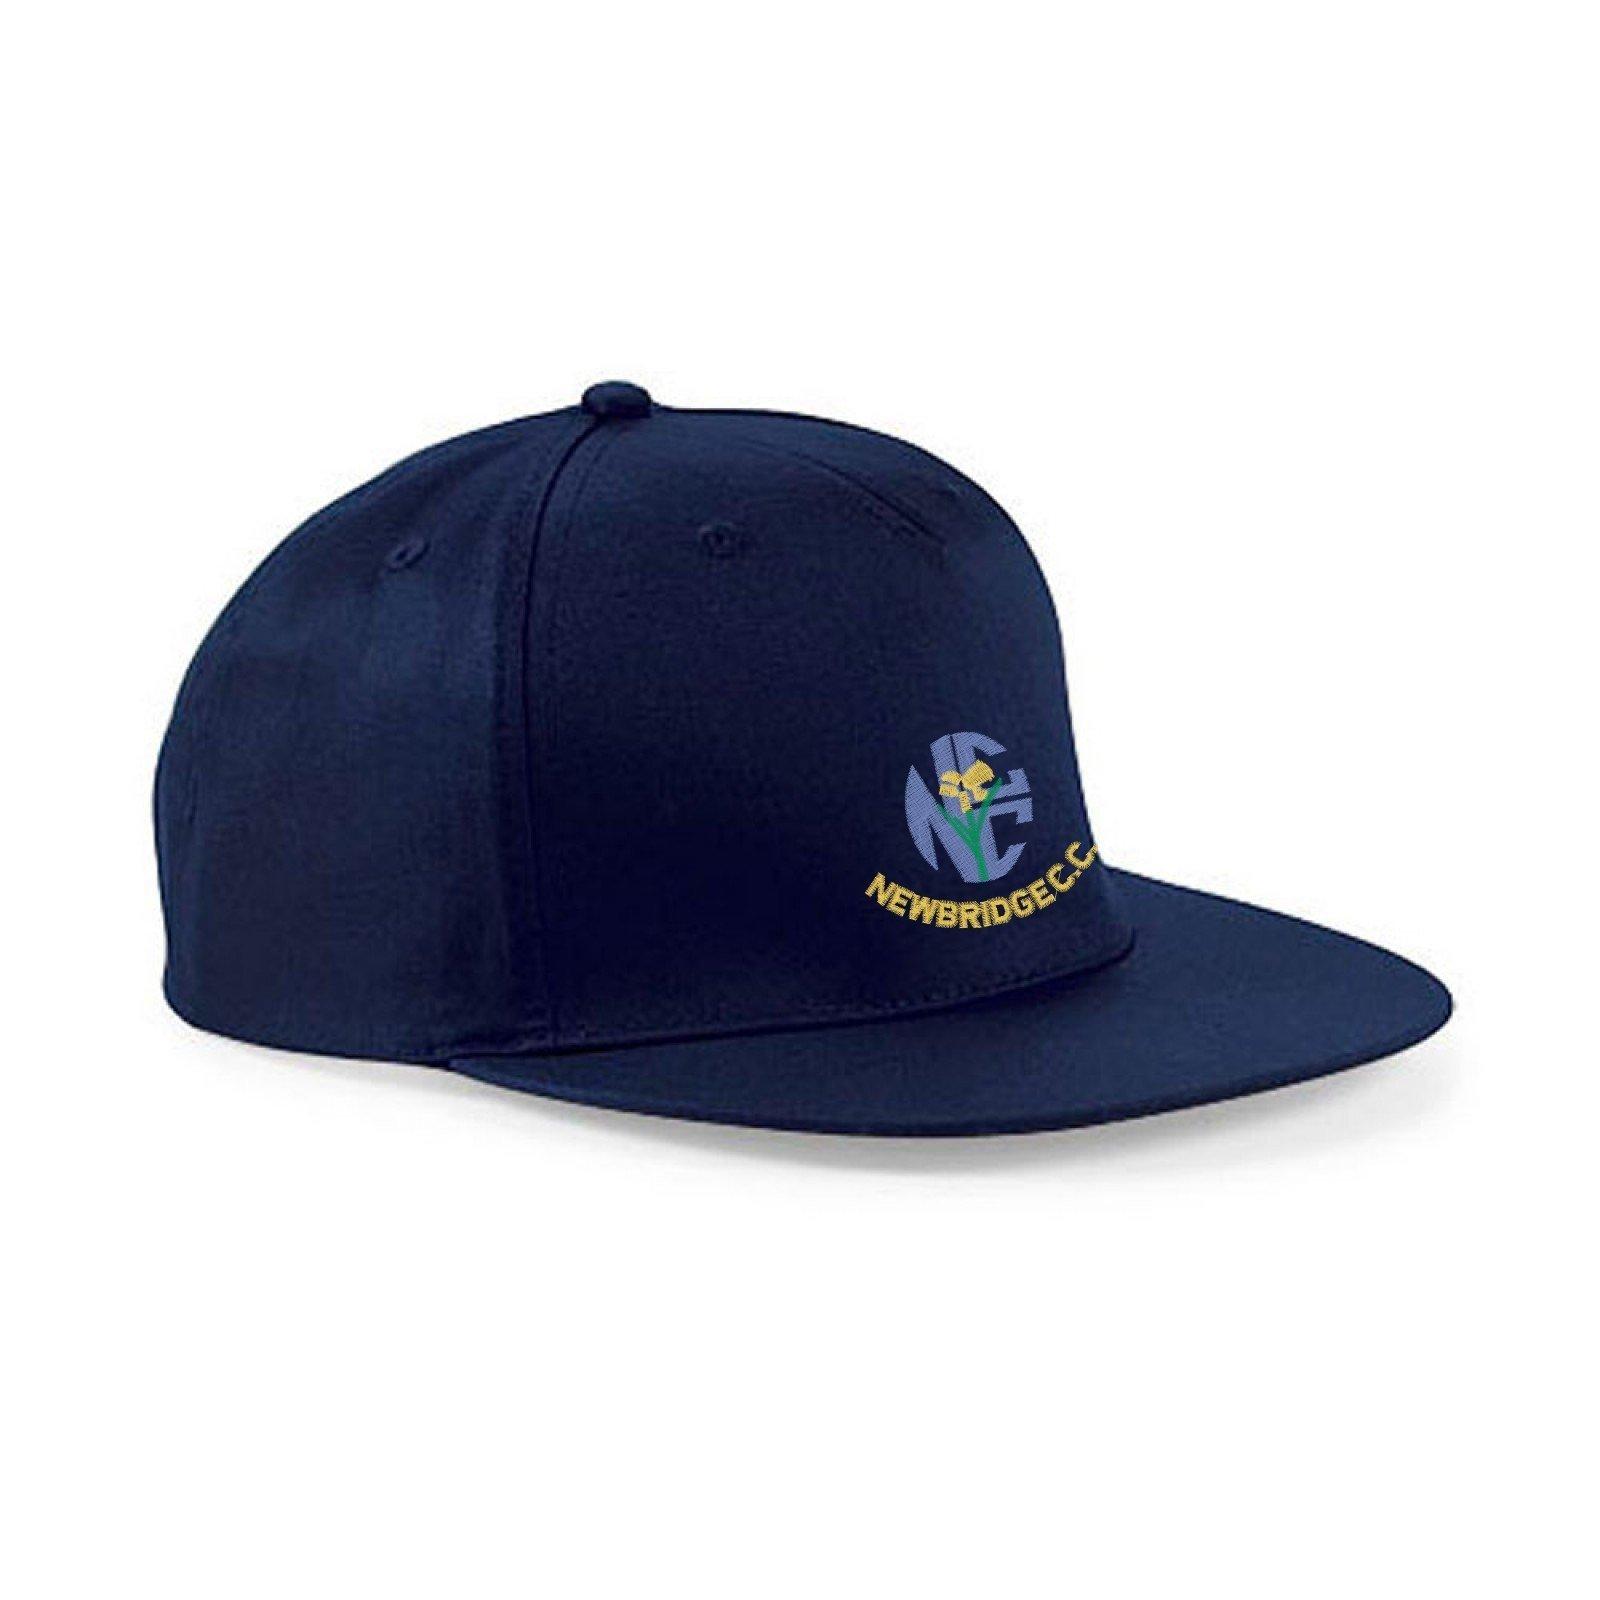 Newbridge CC Navy Snapback Hat